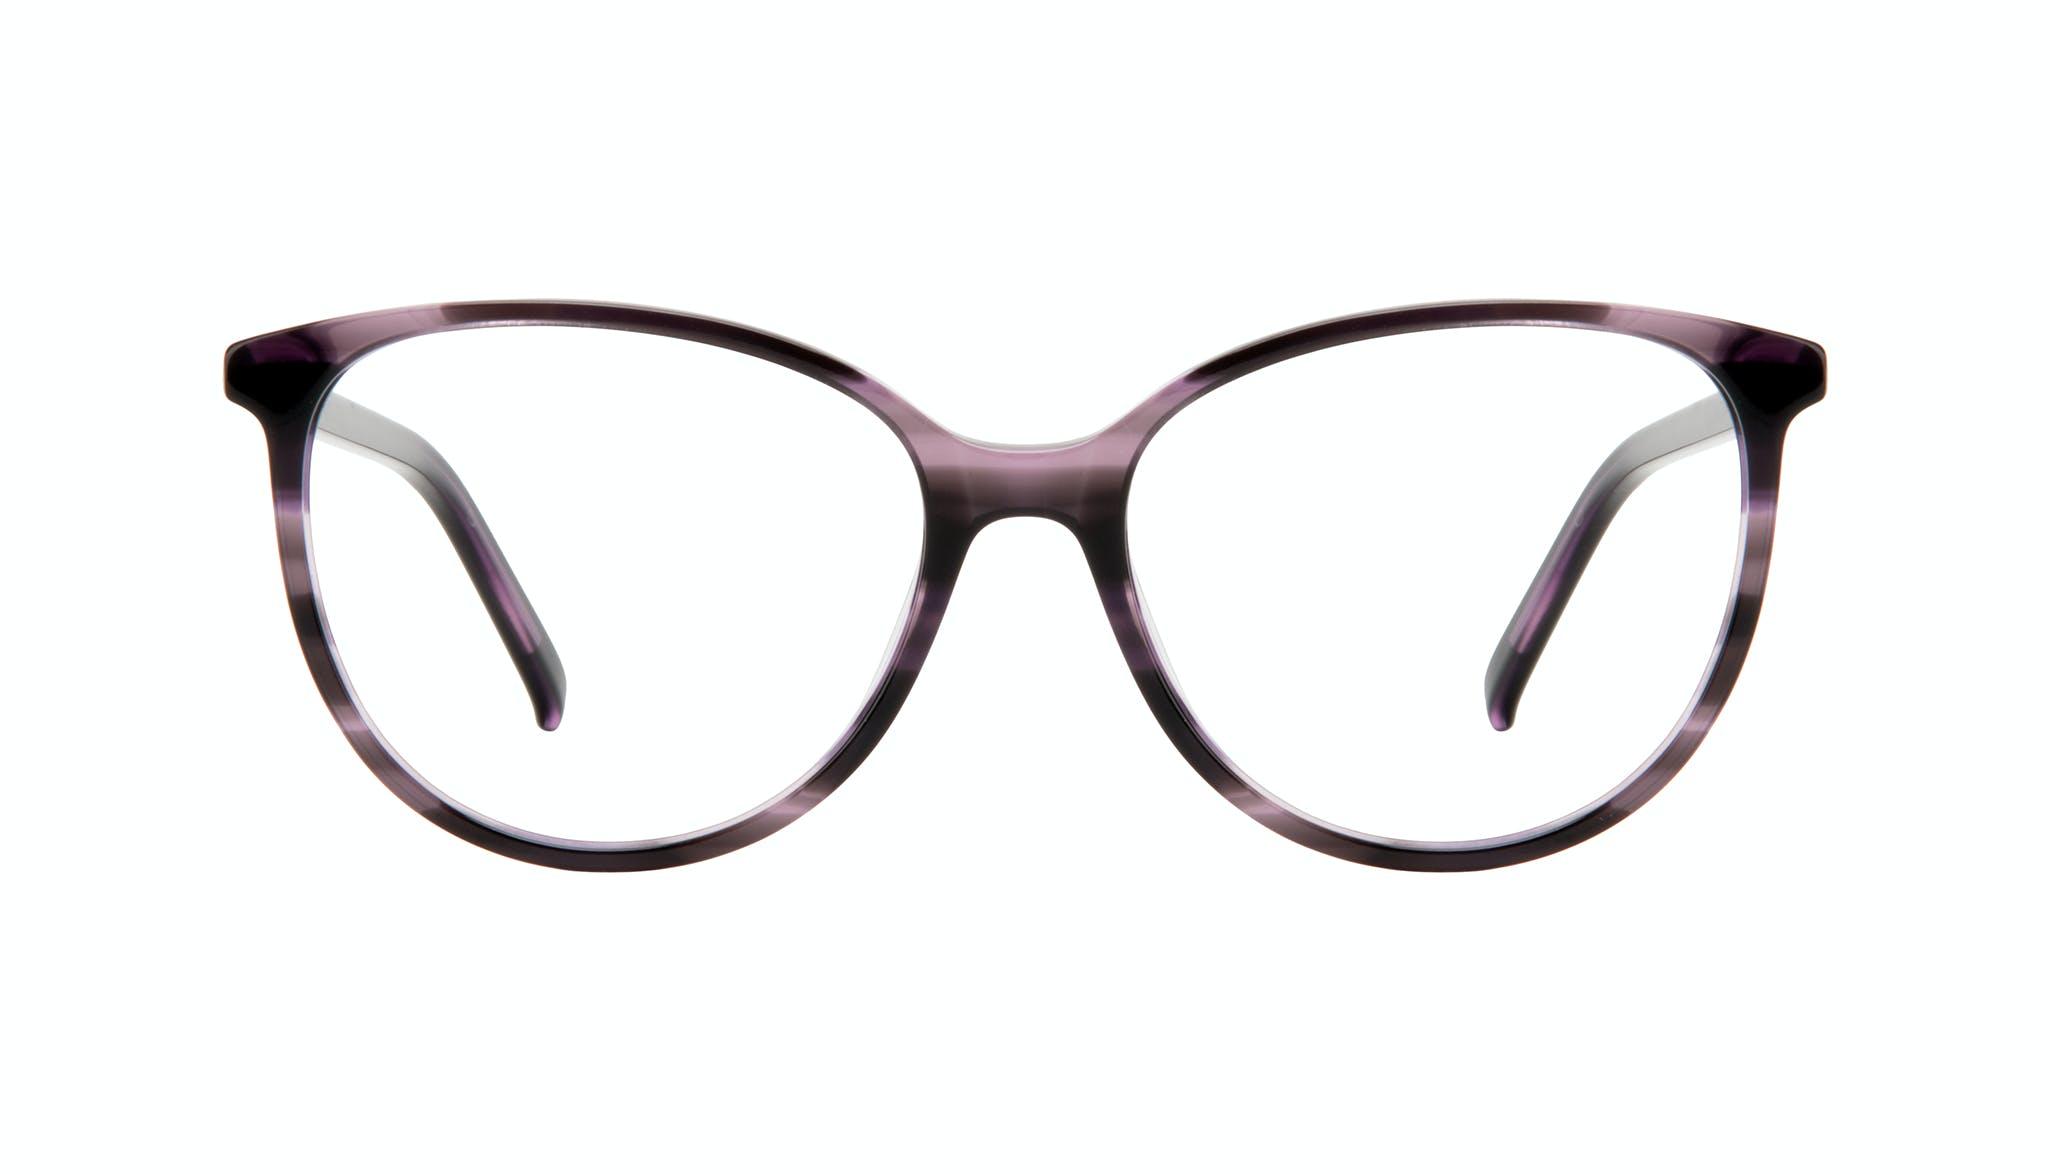 Affordable Fashion Glasses Cat Eye Round Eyeglasses Women Imagine Leopard Front